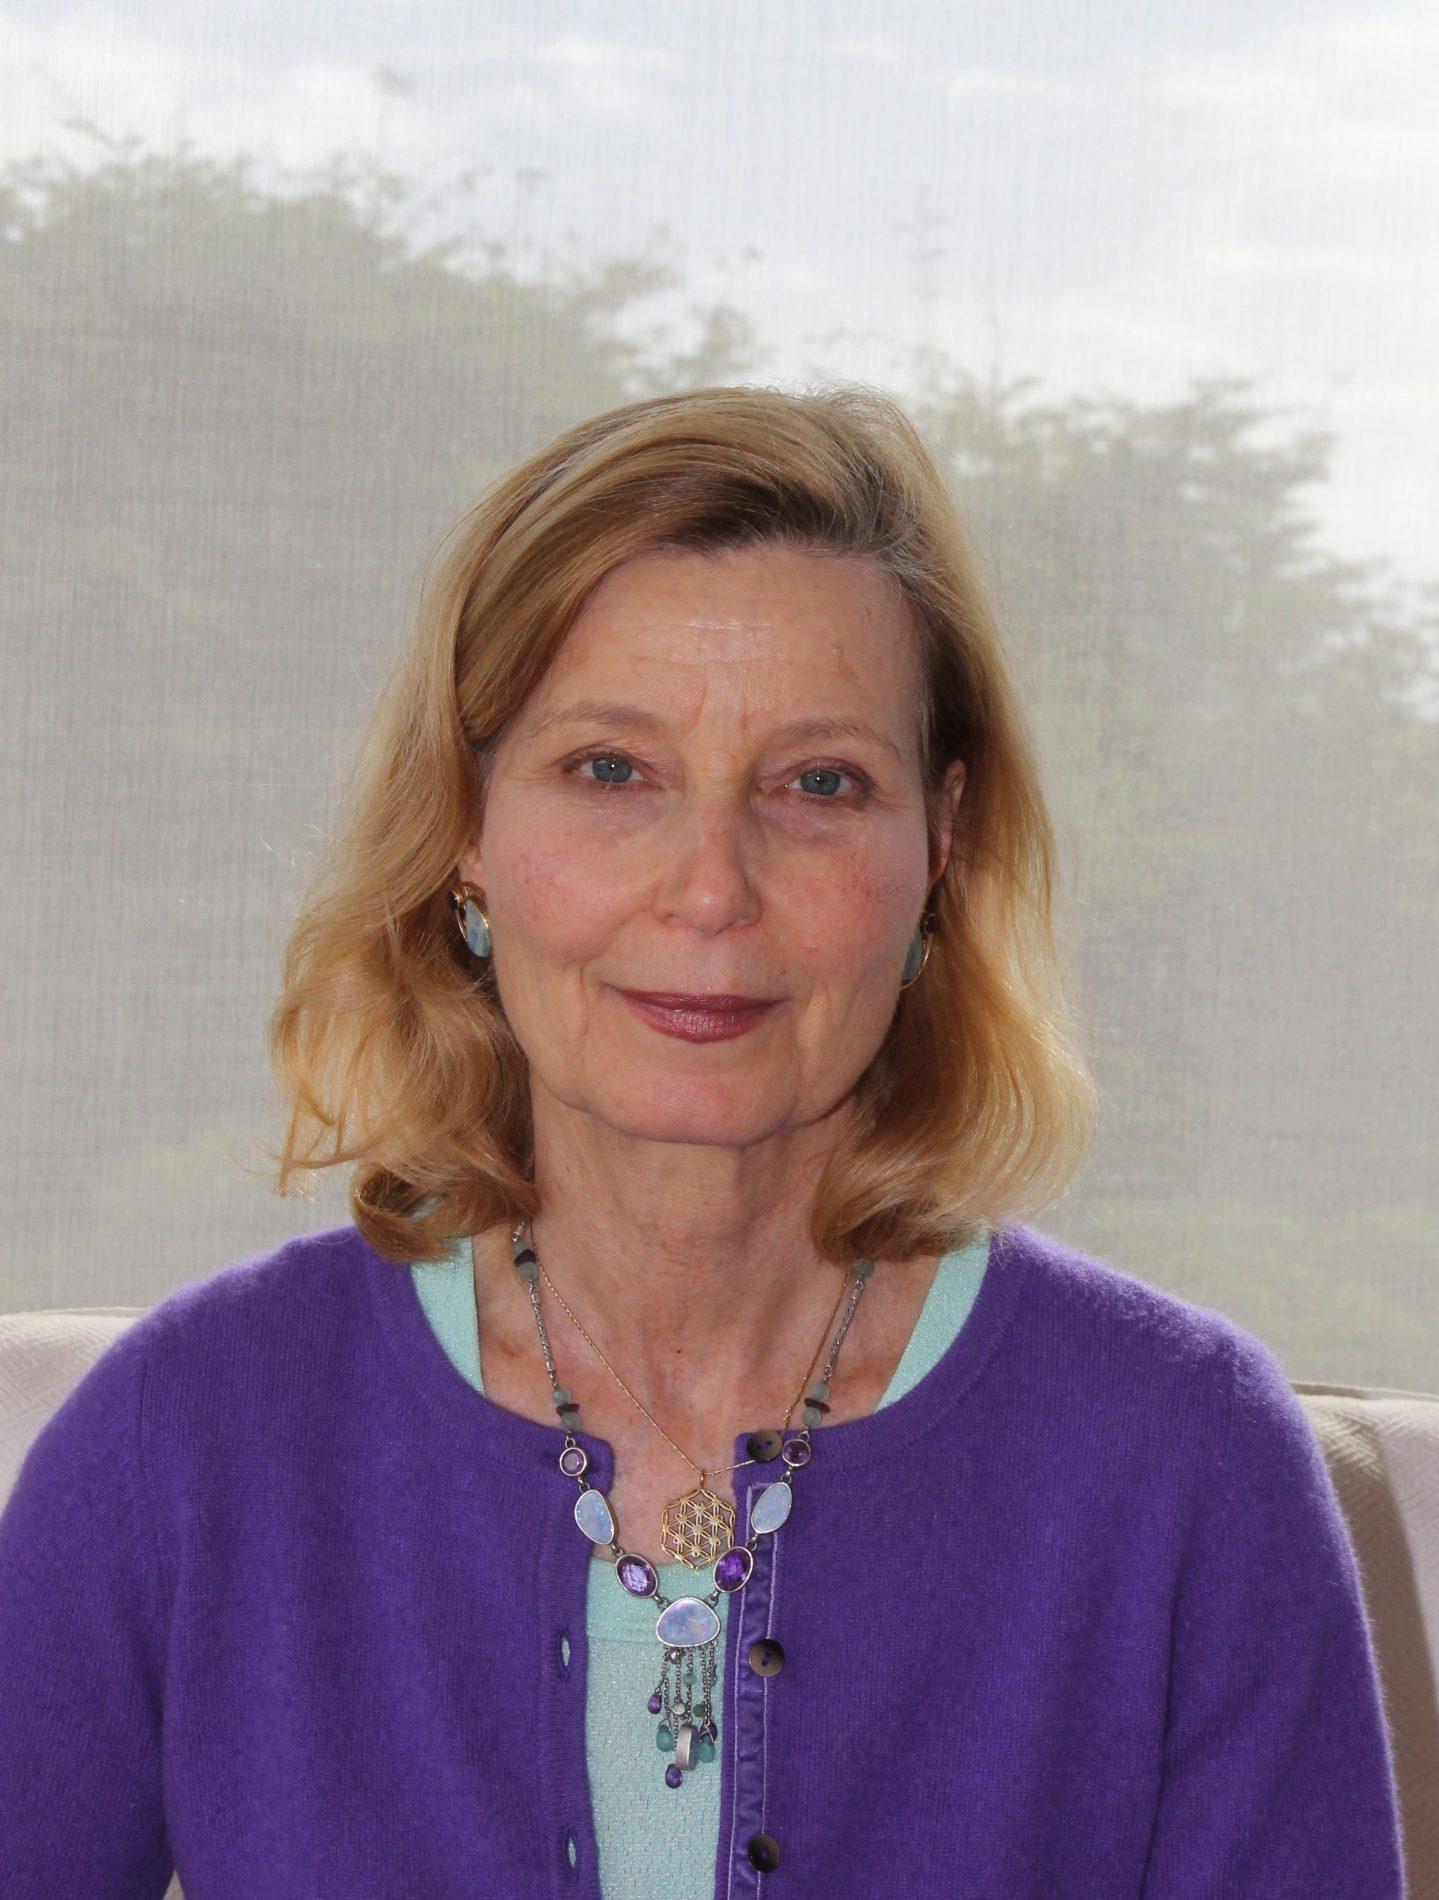 Rebecca Picard, LMFT